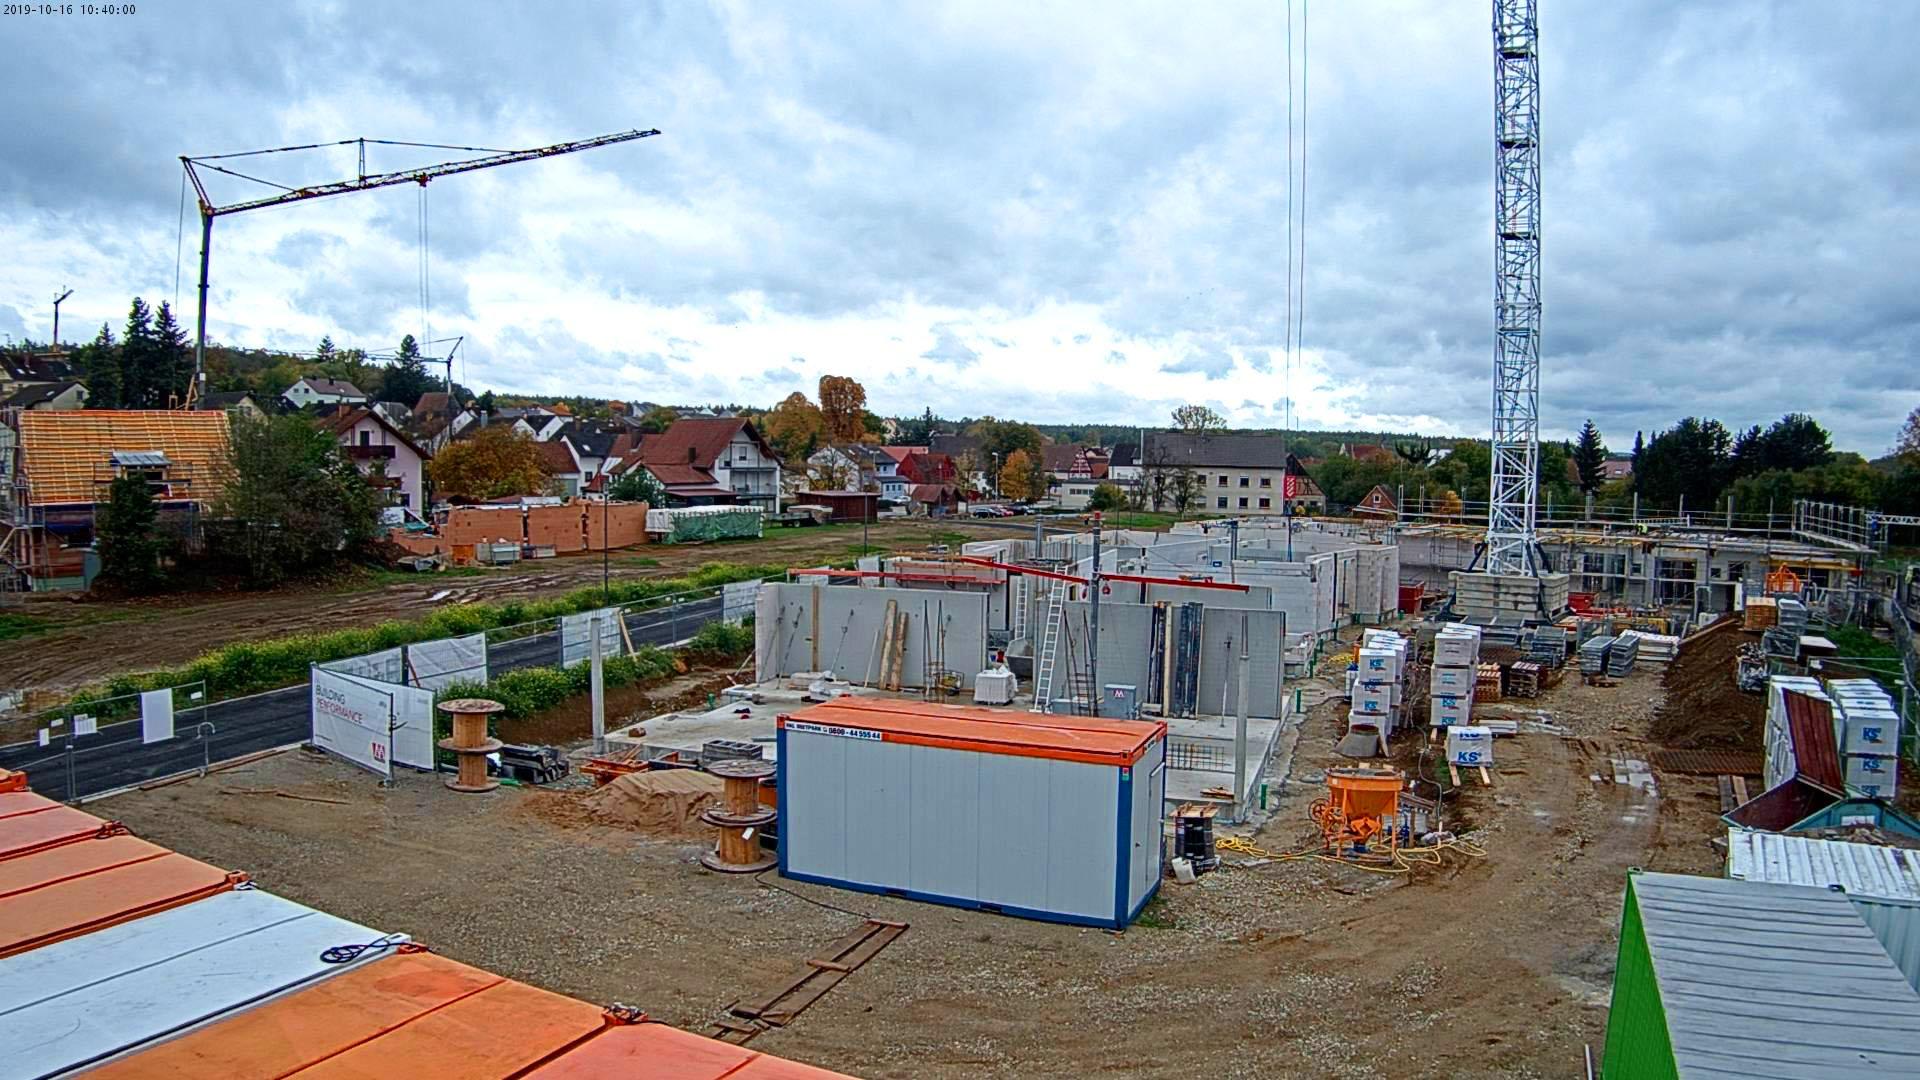 Baustelle Ellernpark Oktober 2019